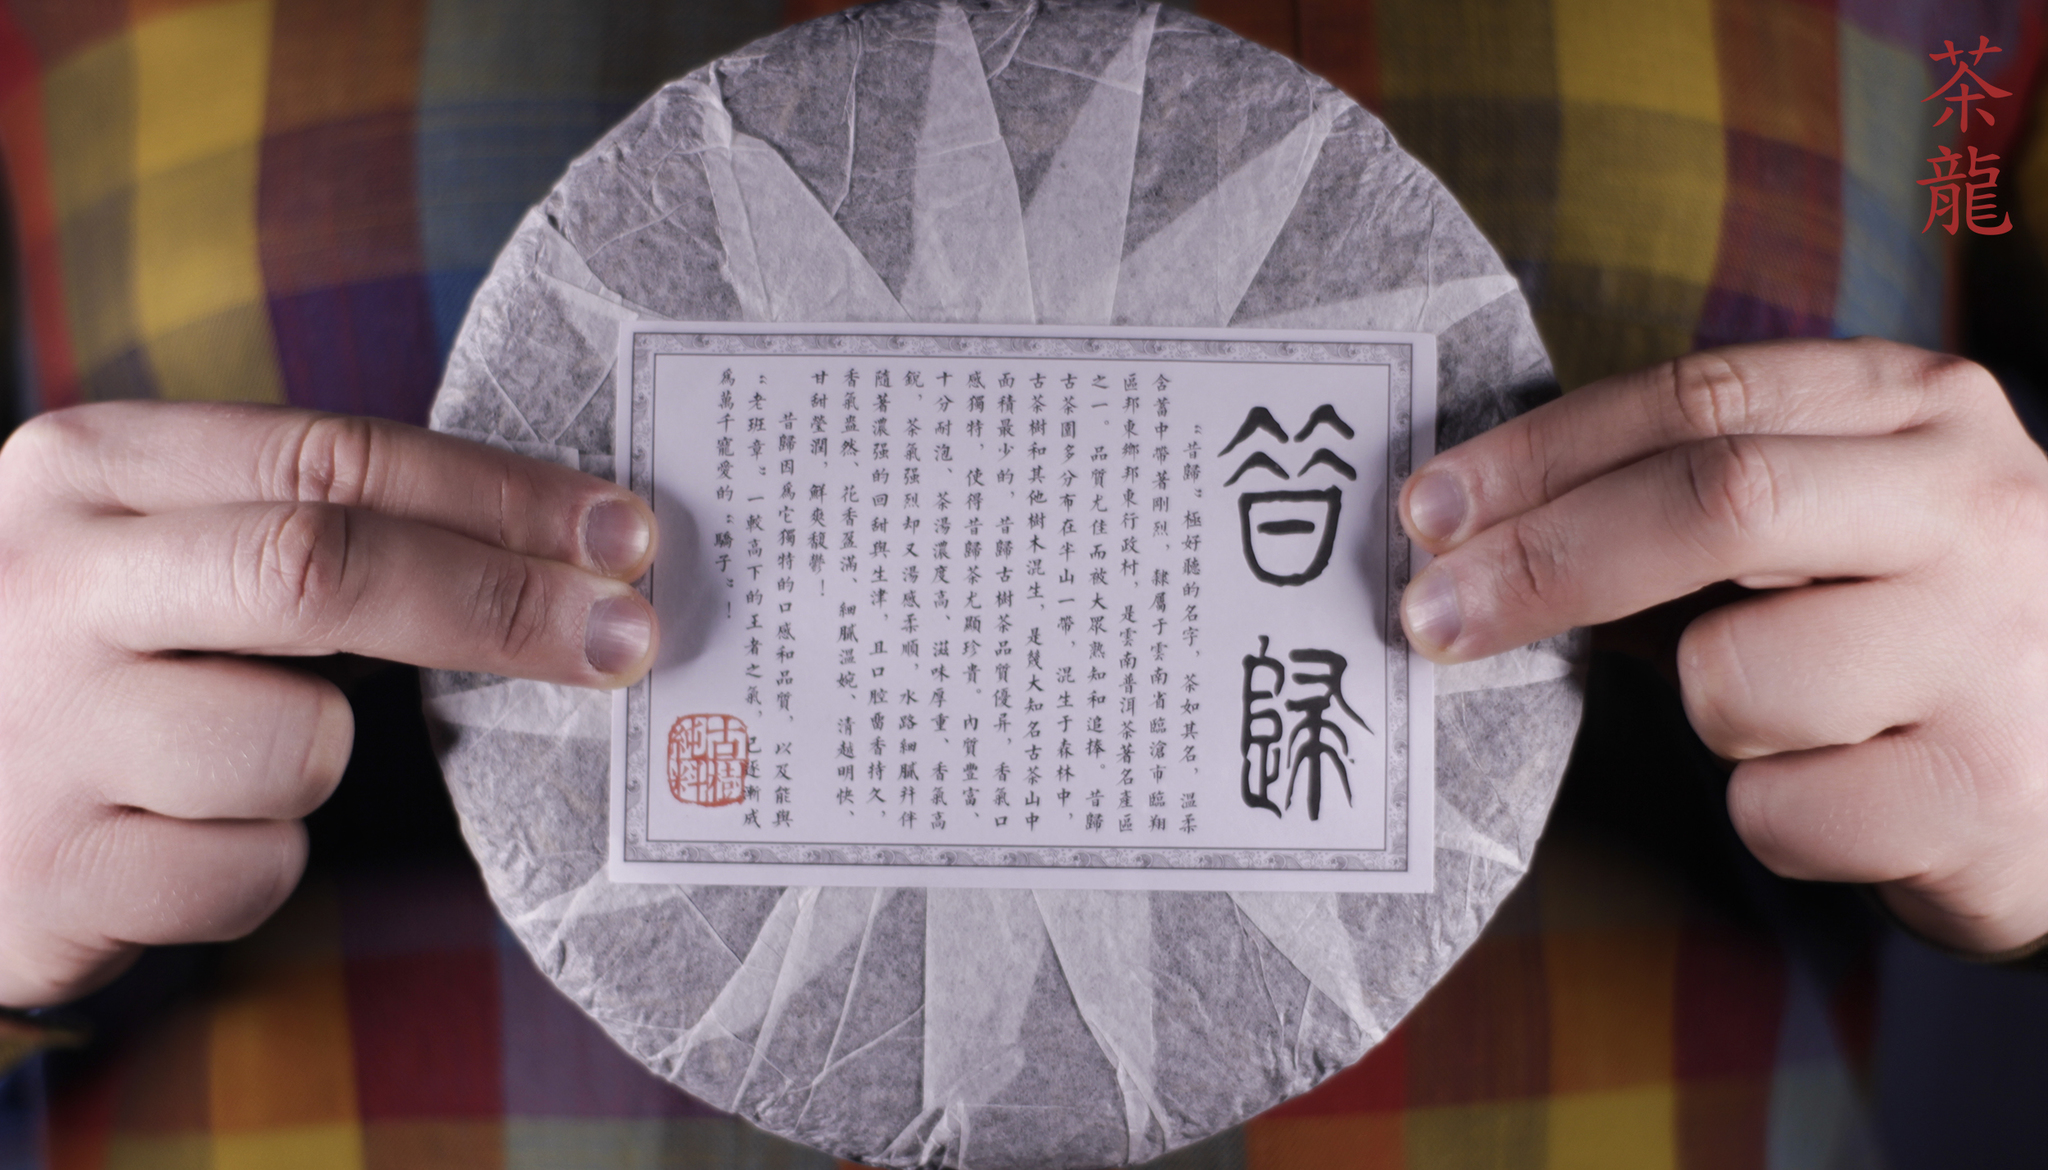 Си Гуй Шен пуэр